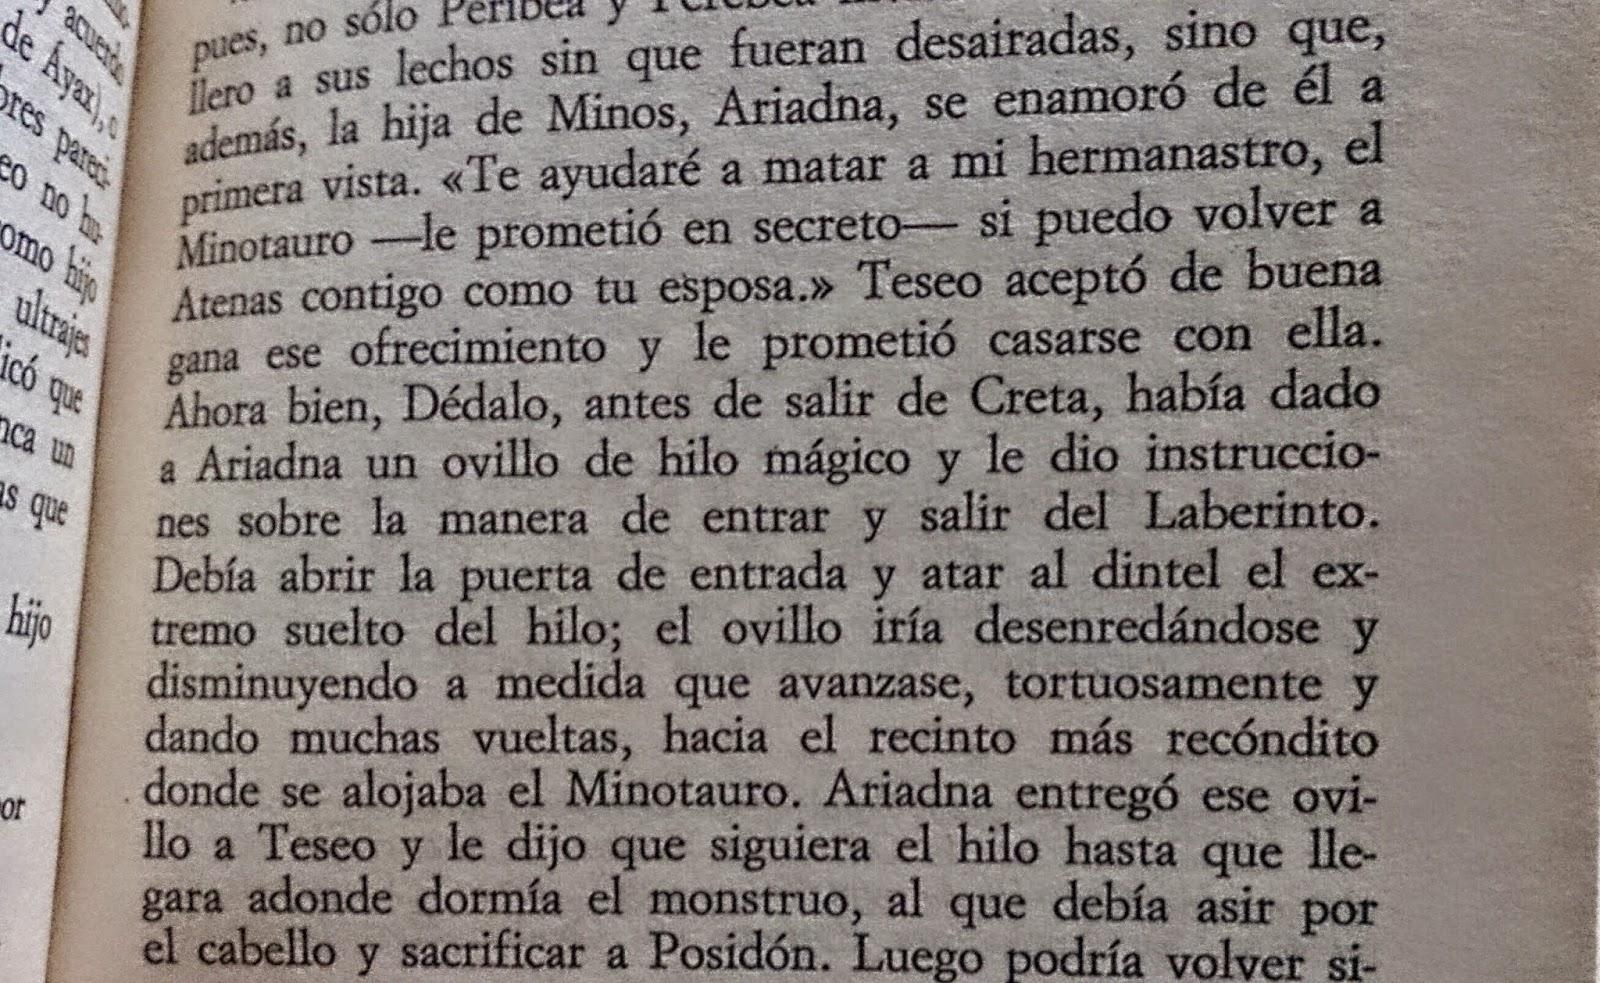 Teseo en Creta. Los Mitos Griegos. Robert Graves. Ariadna. Minotauro